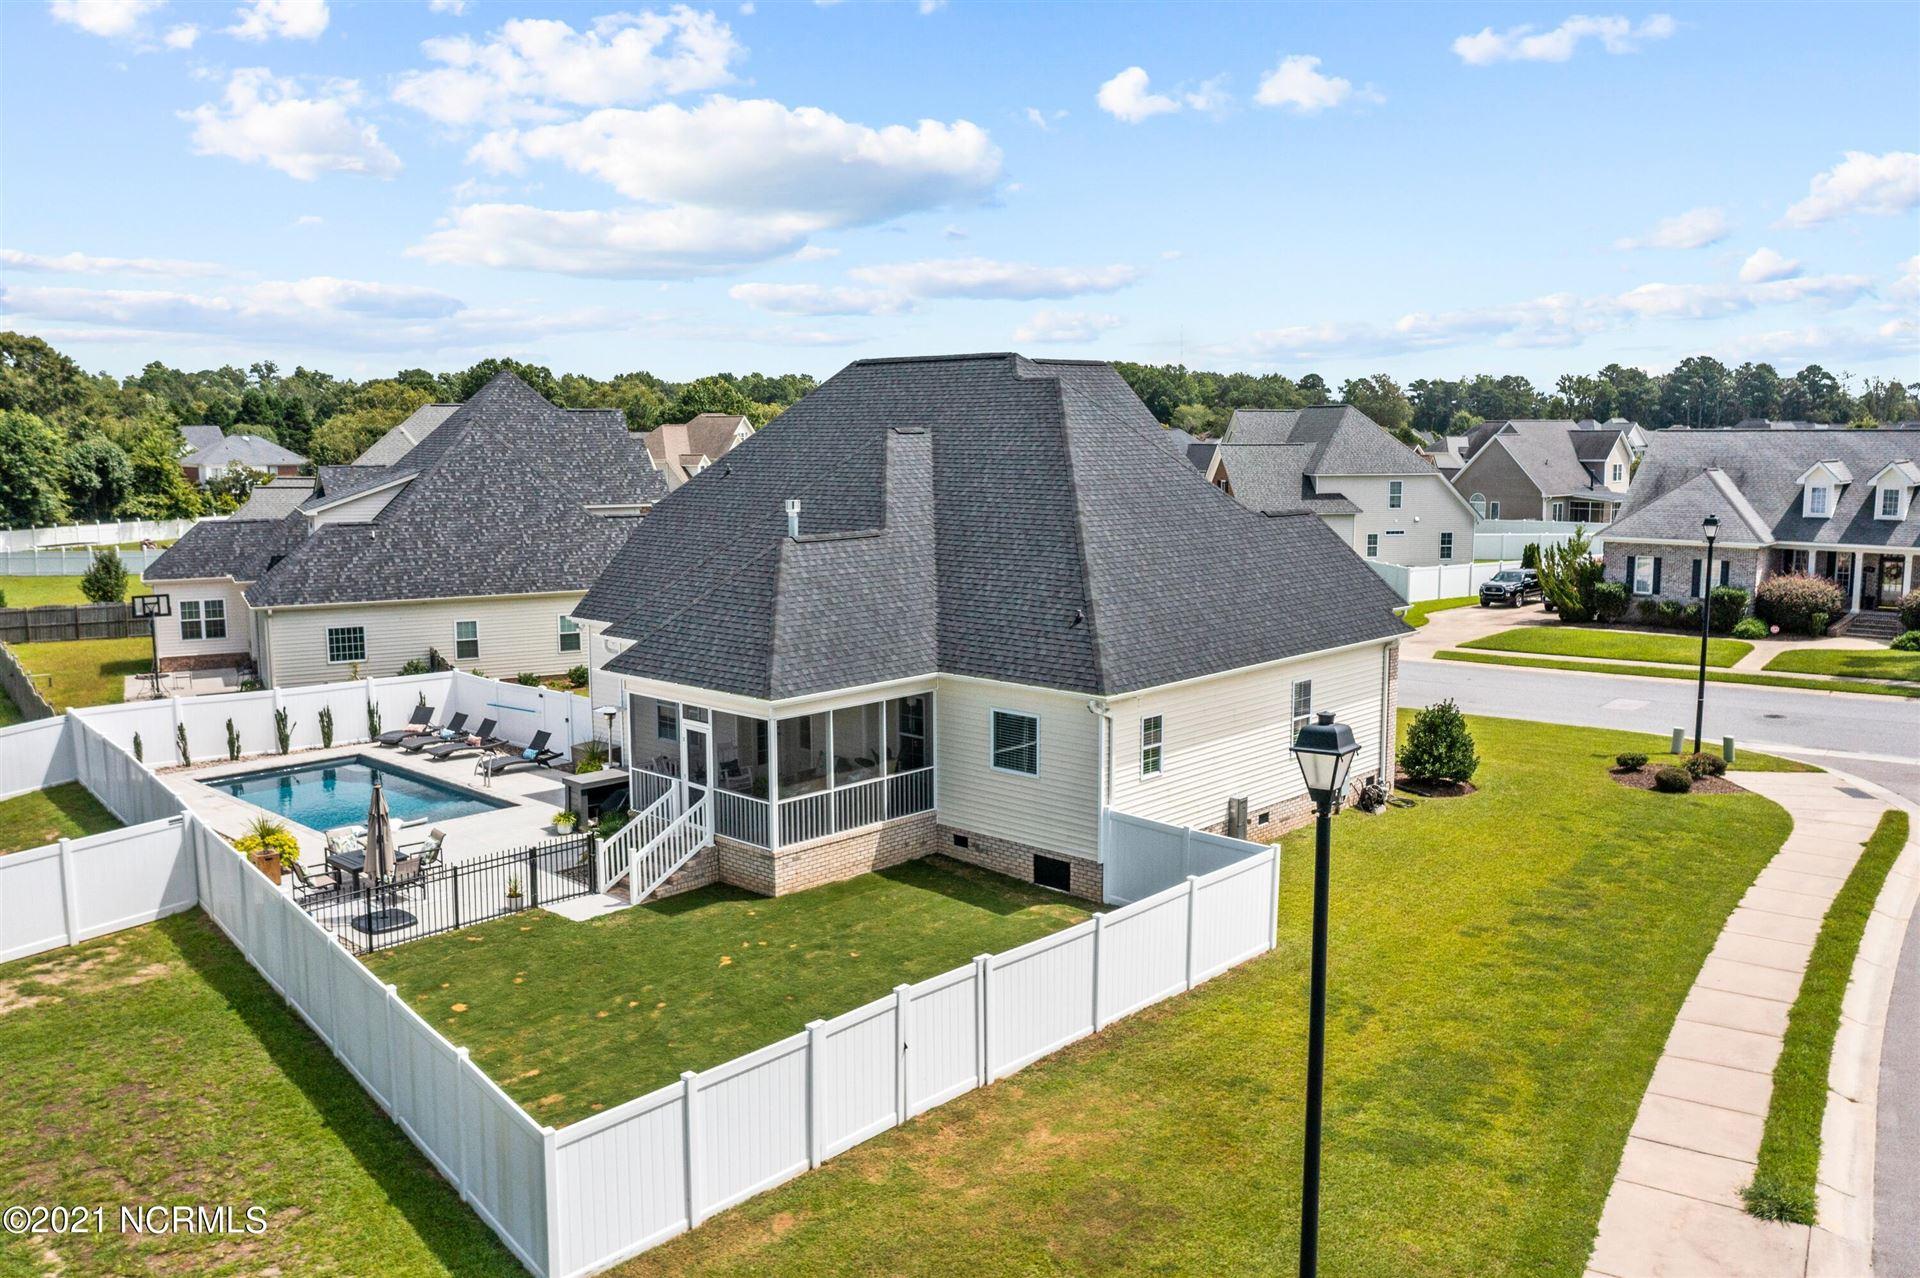 Photo of 169 Blackwater Drive, Winterville, NC 28590 (MLS # 100288587)